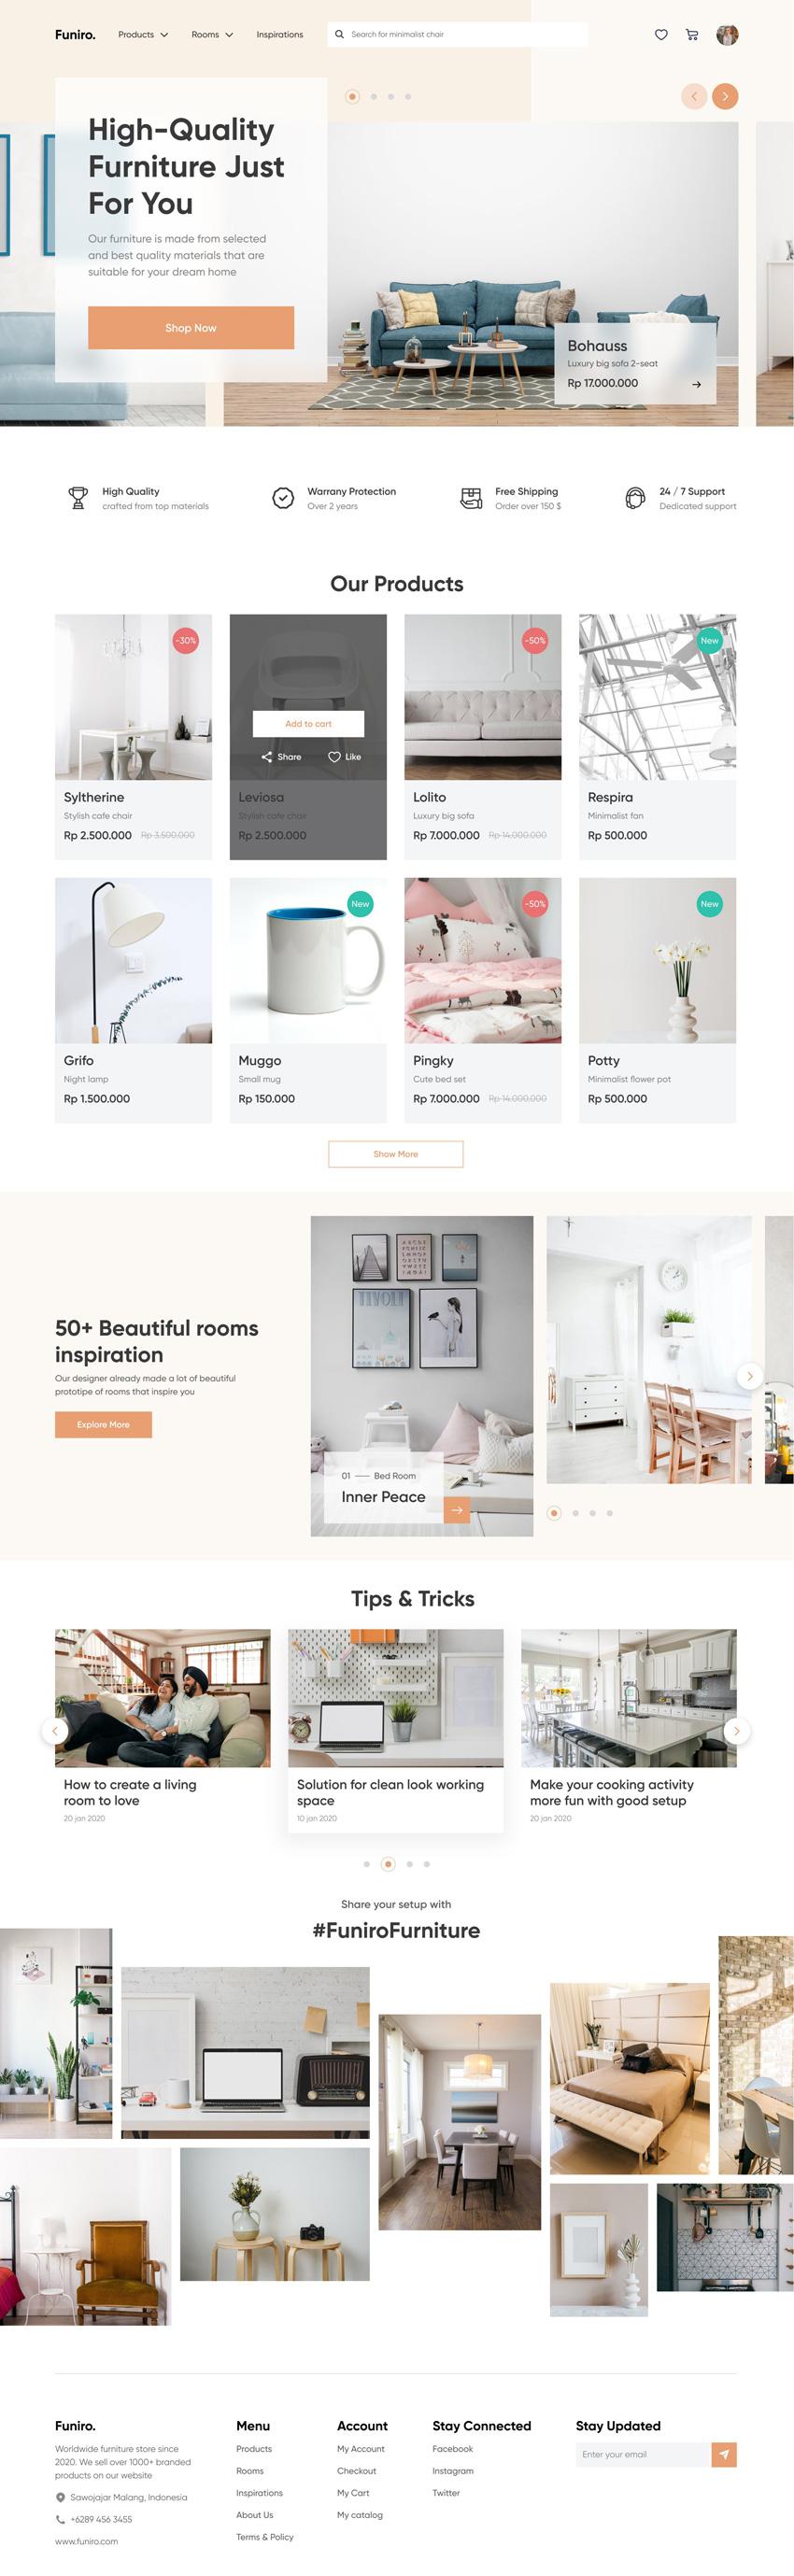 Furniture Shop WebDesign figma free download